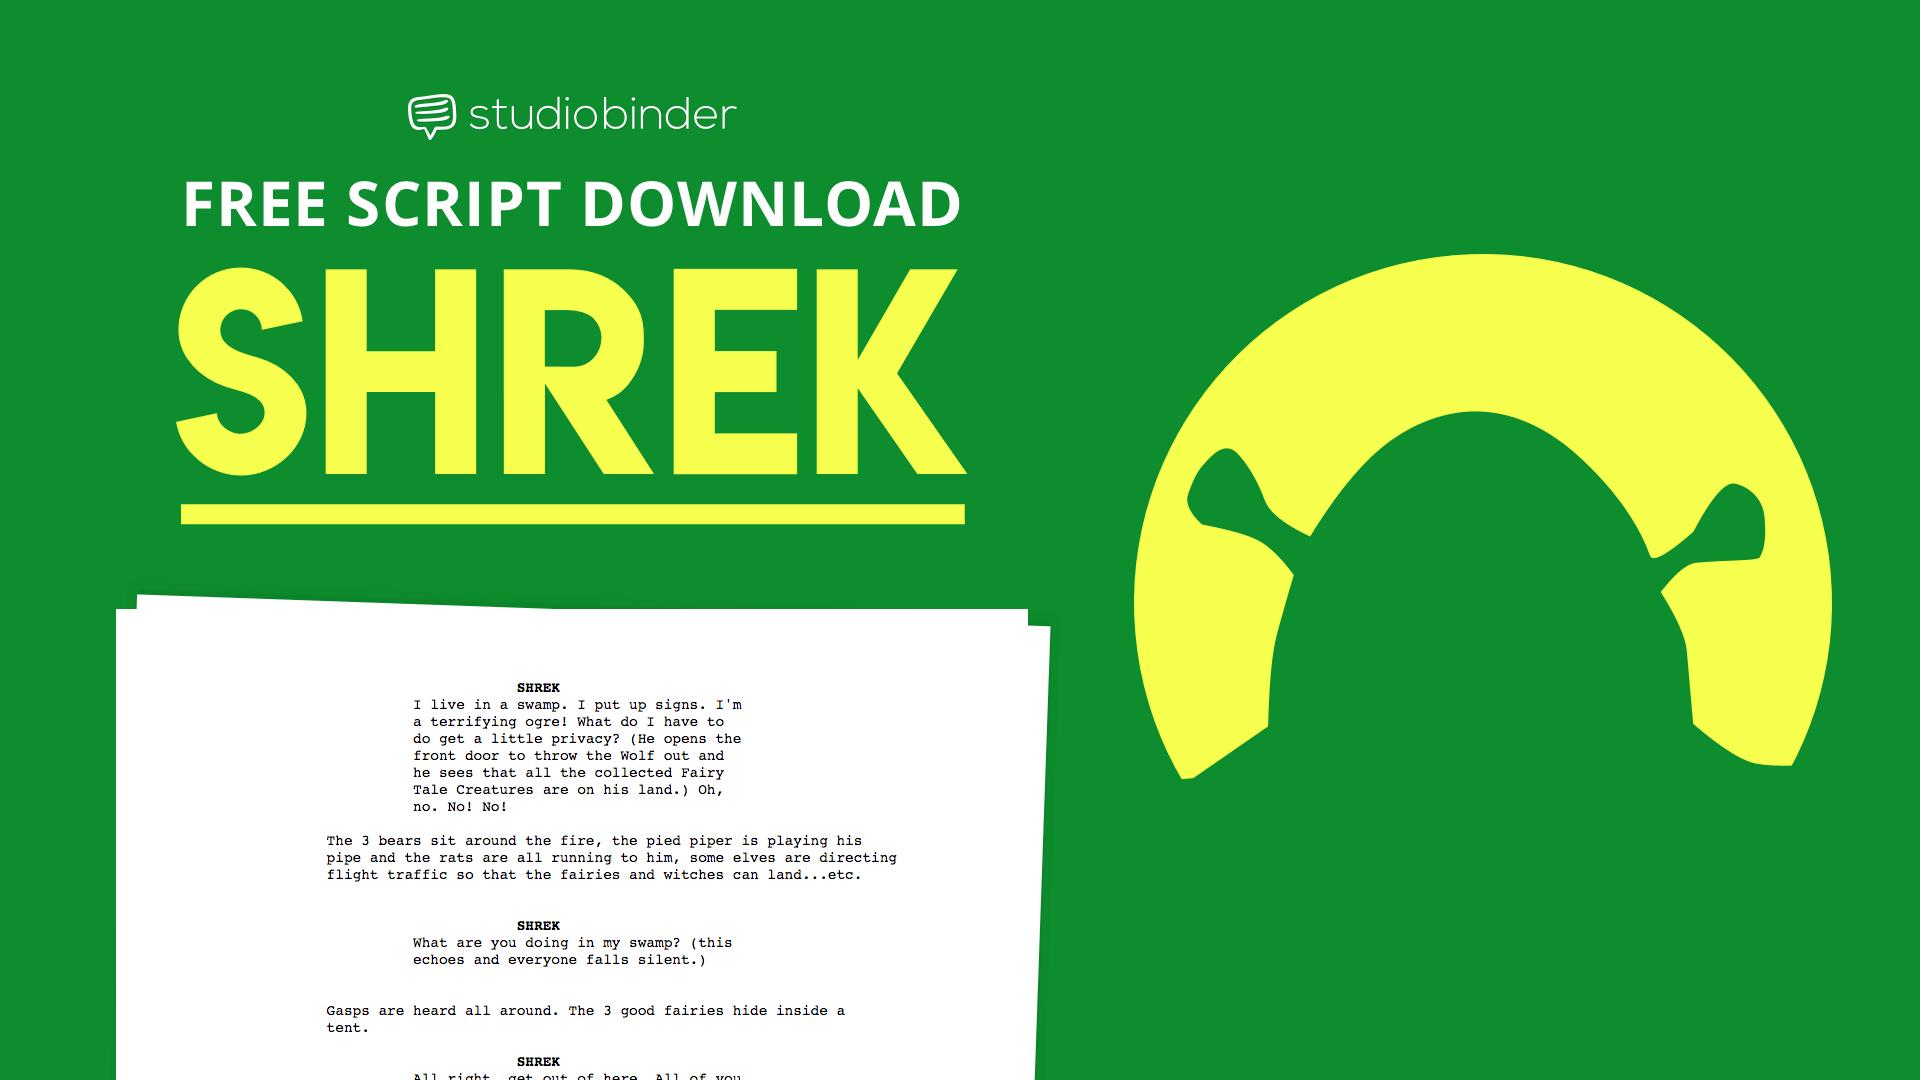 shrek script explained  download the entire shrek script pdf free